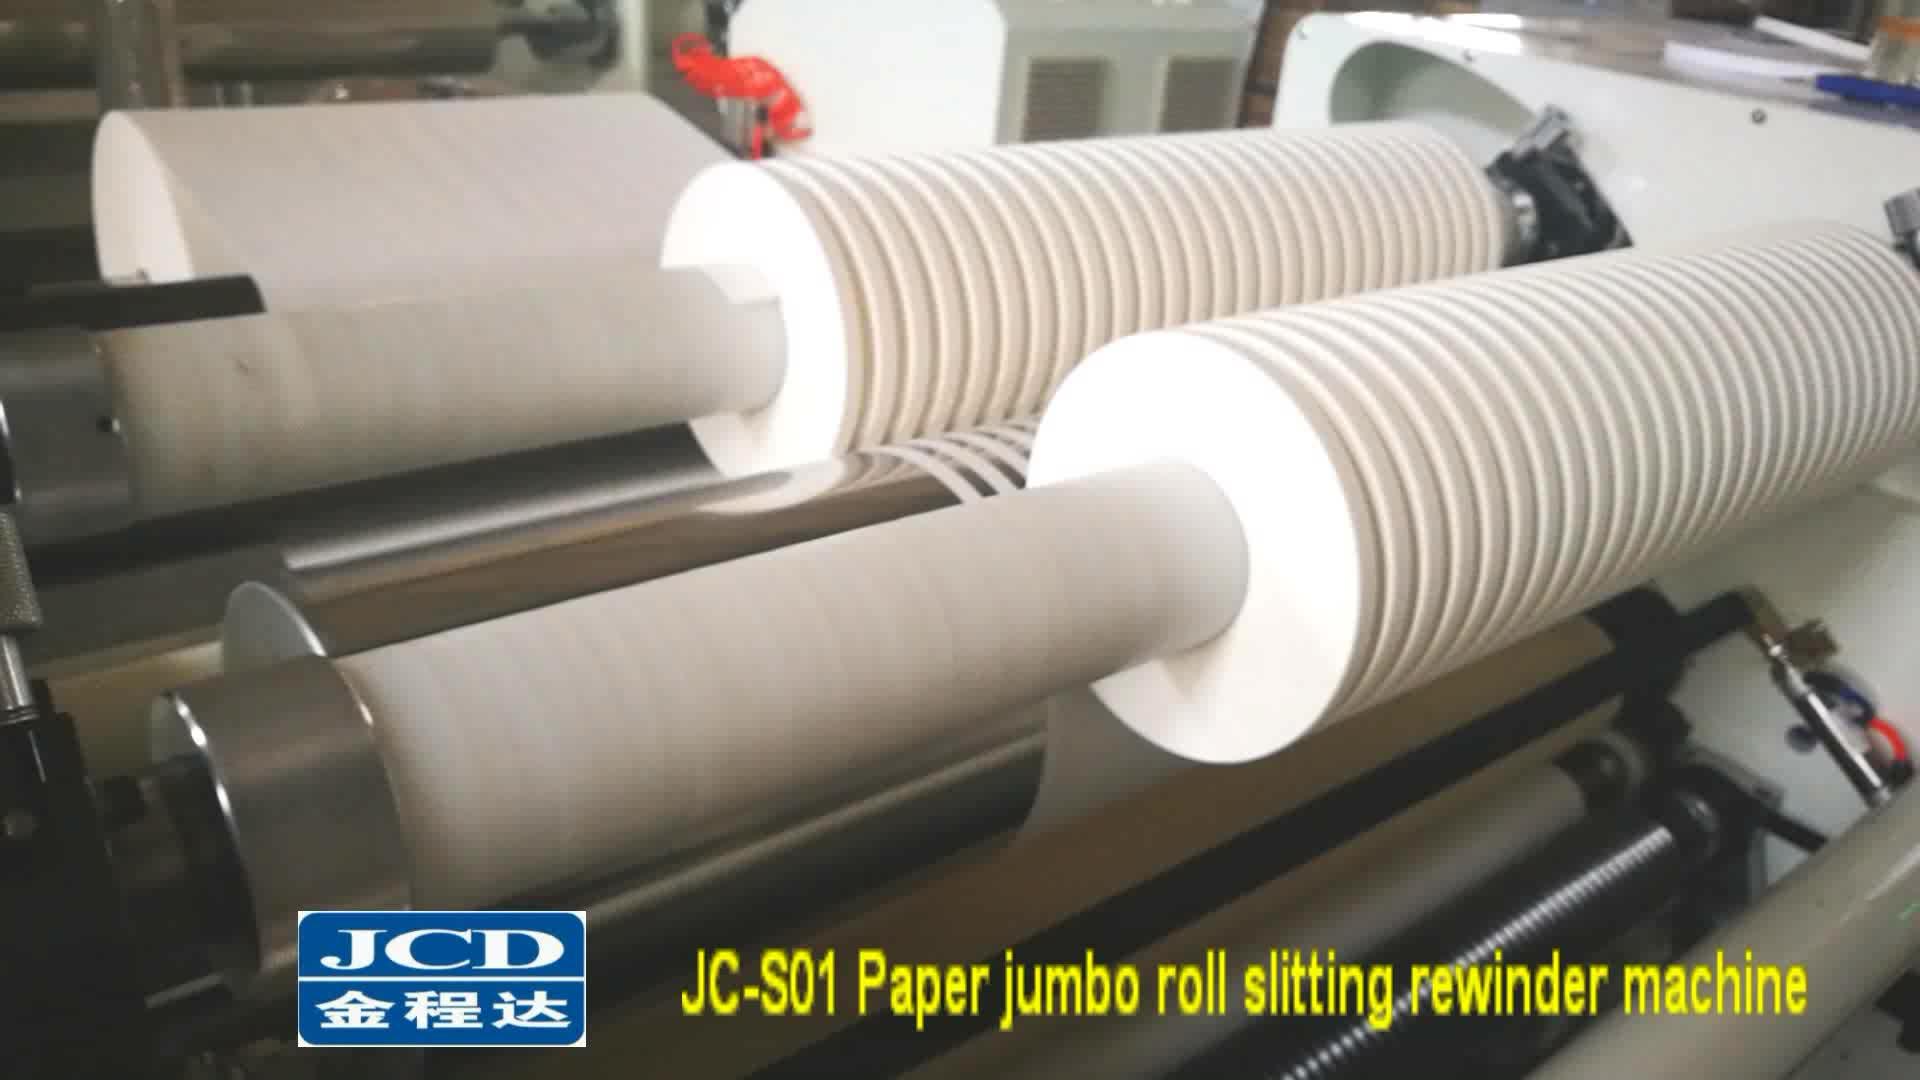 High precision label paper jumbo roll slitter rewinder